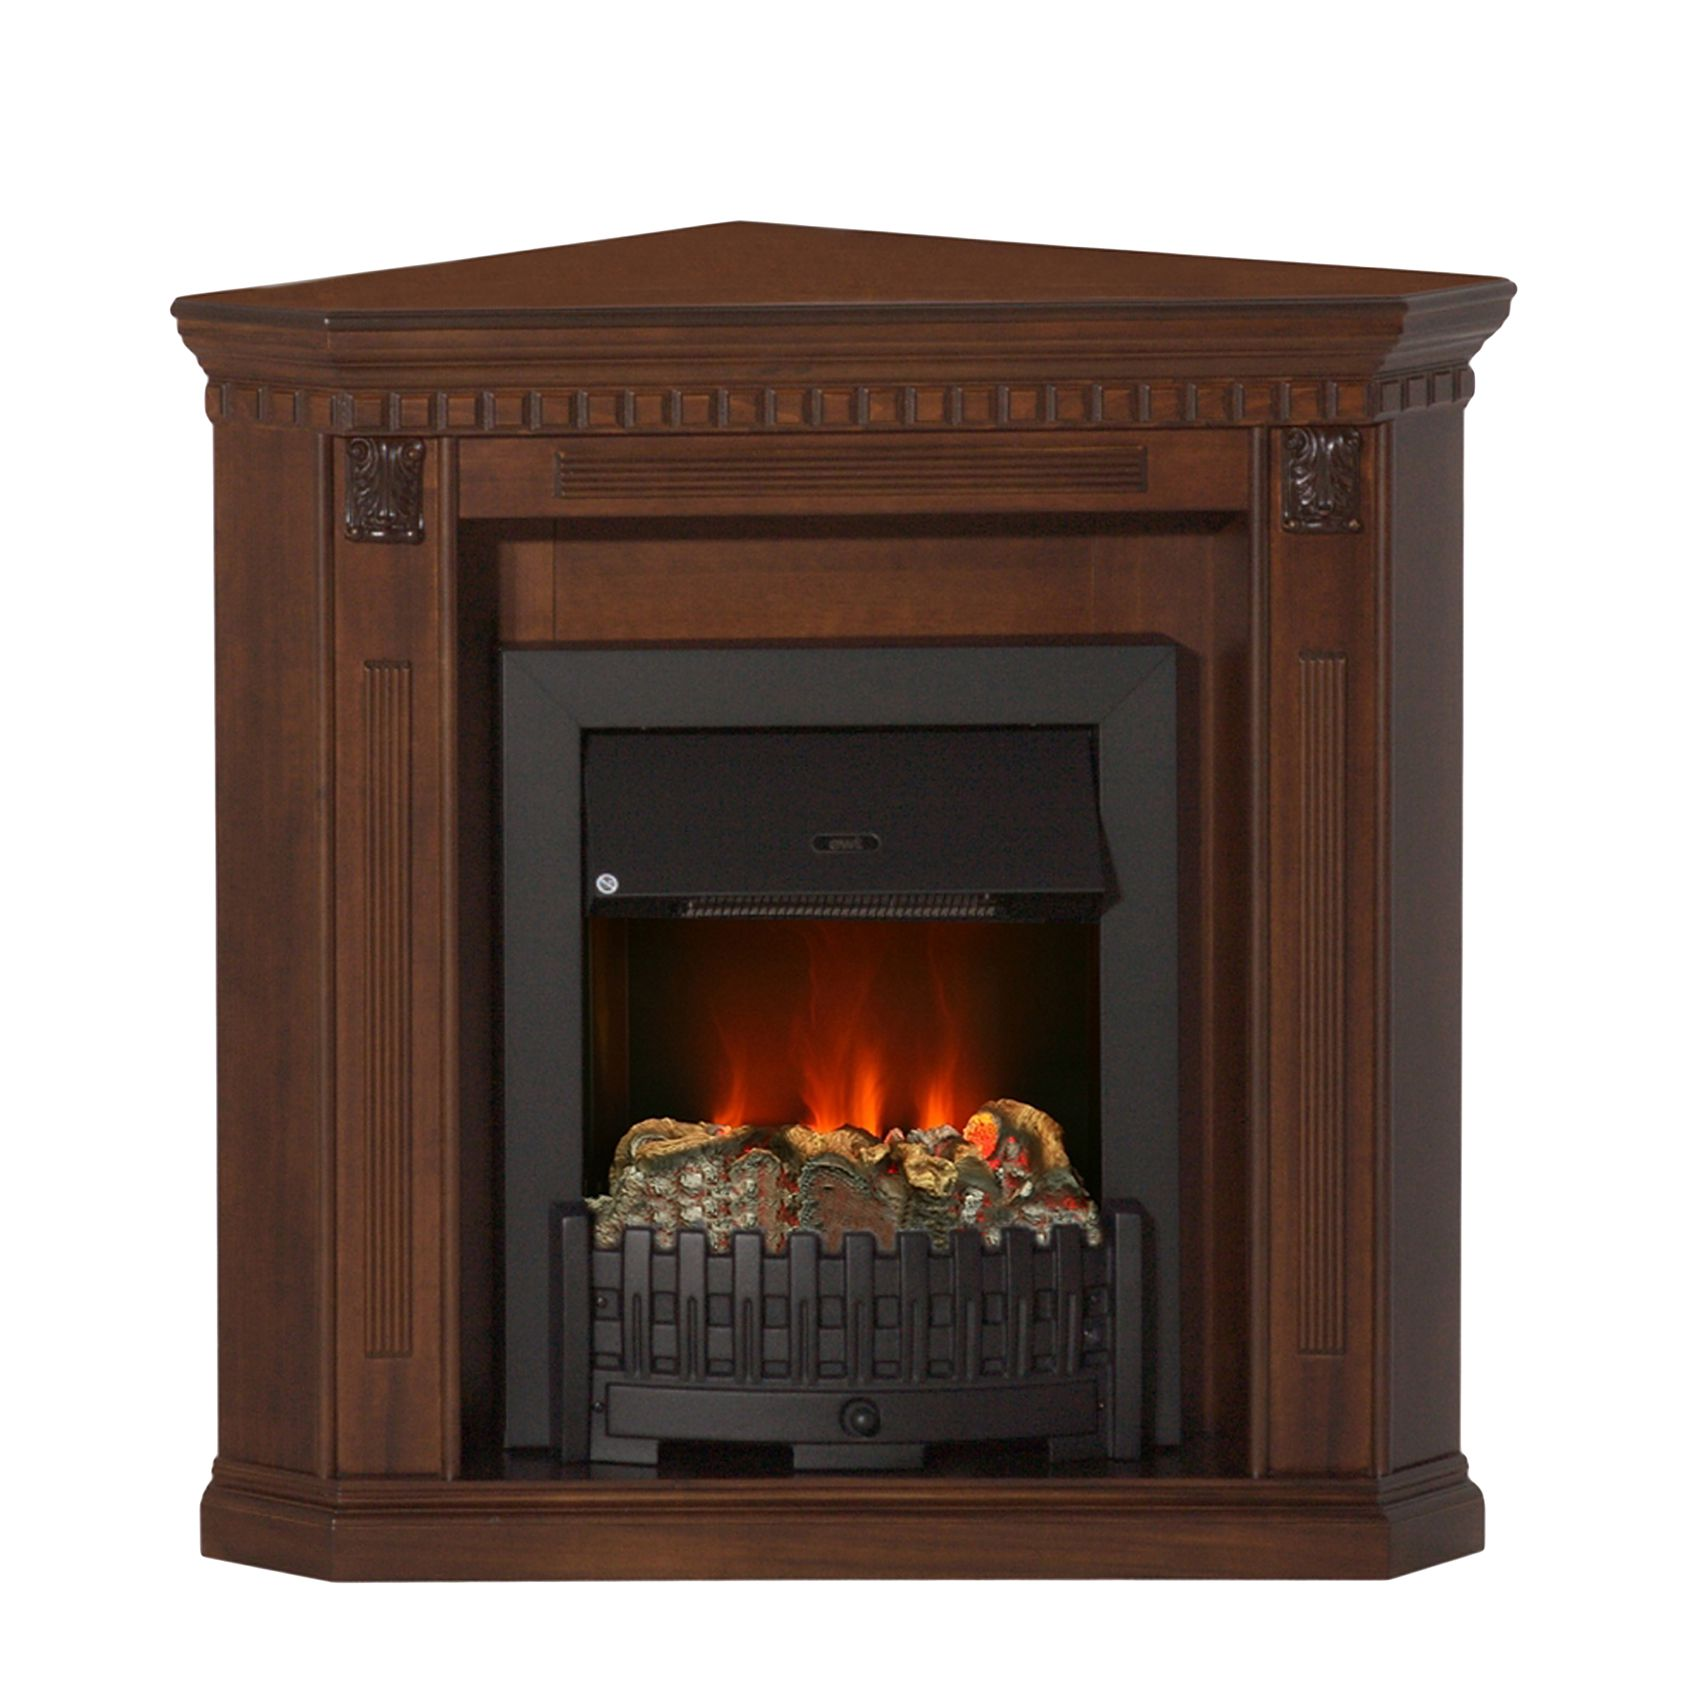 vente cheminee tritoo maison et jardin. Black Bedroom Furniture Sets. Home Design Ideas